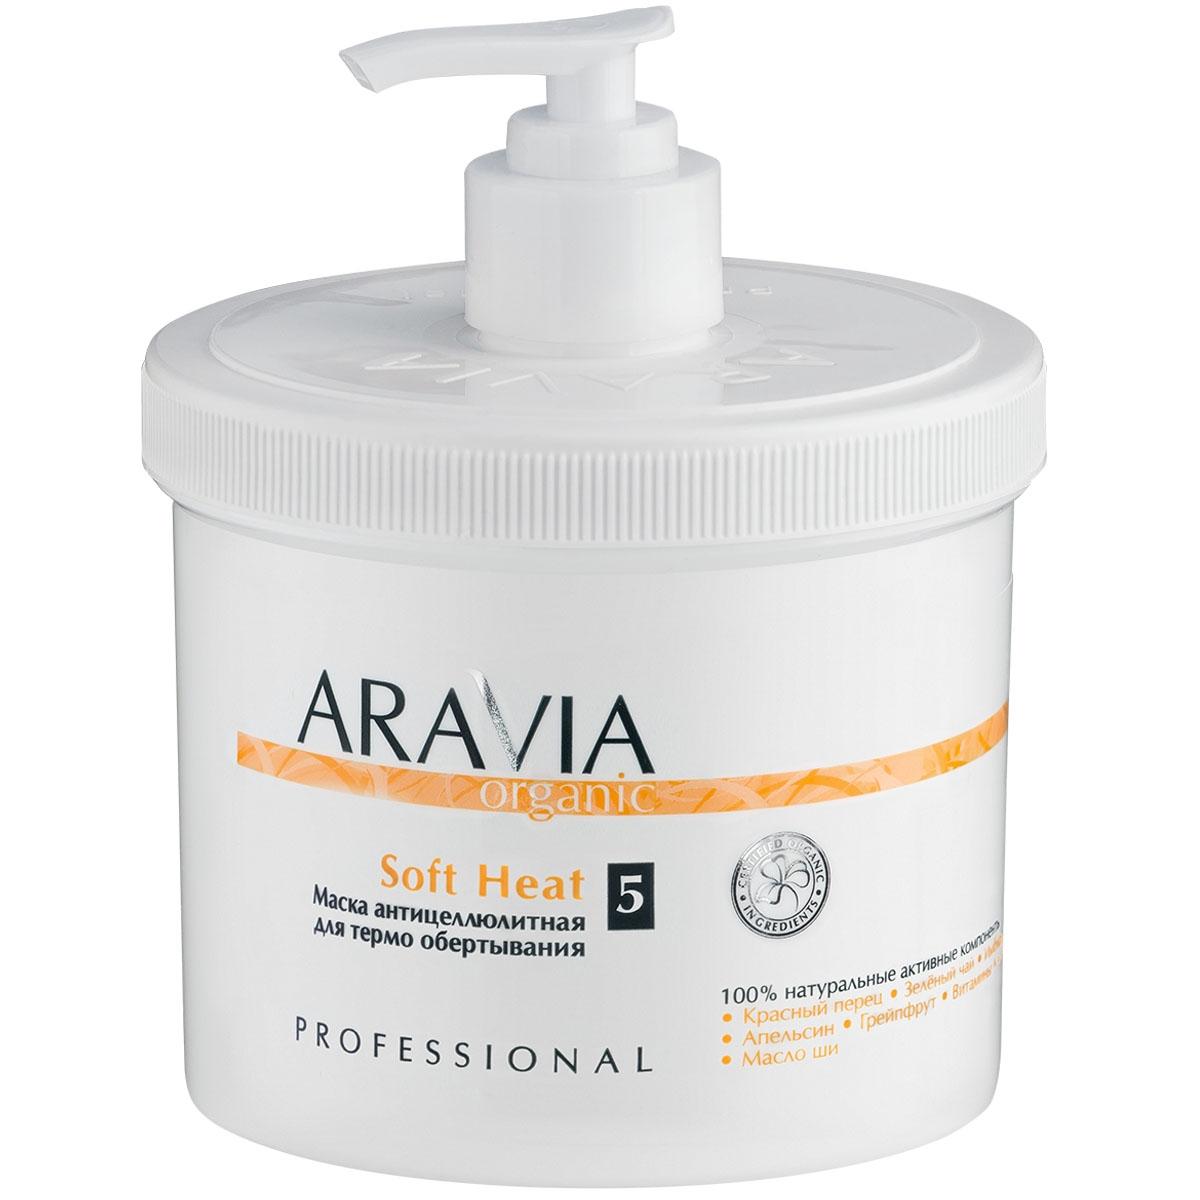 ARAVIA ARAVIA Organic Маска Антицеллюлитная для Термо Обертывания «Soft Heat», 550 мл